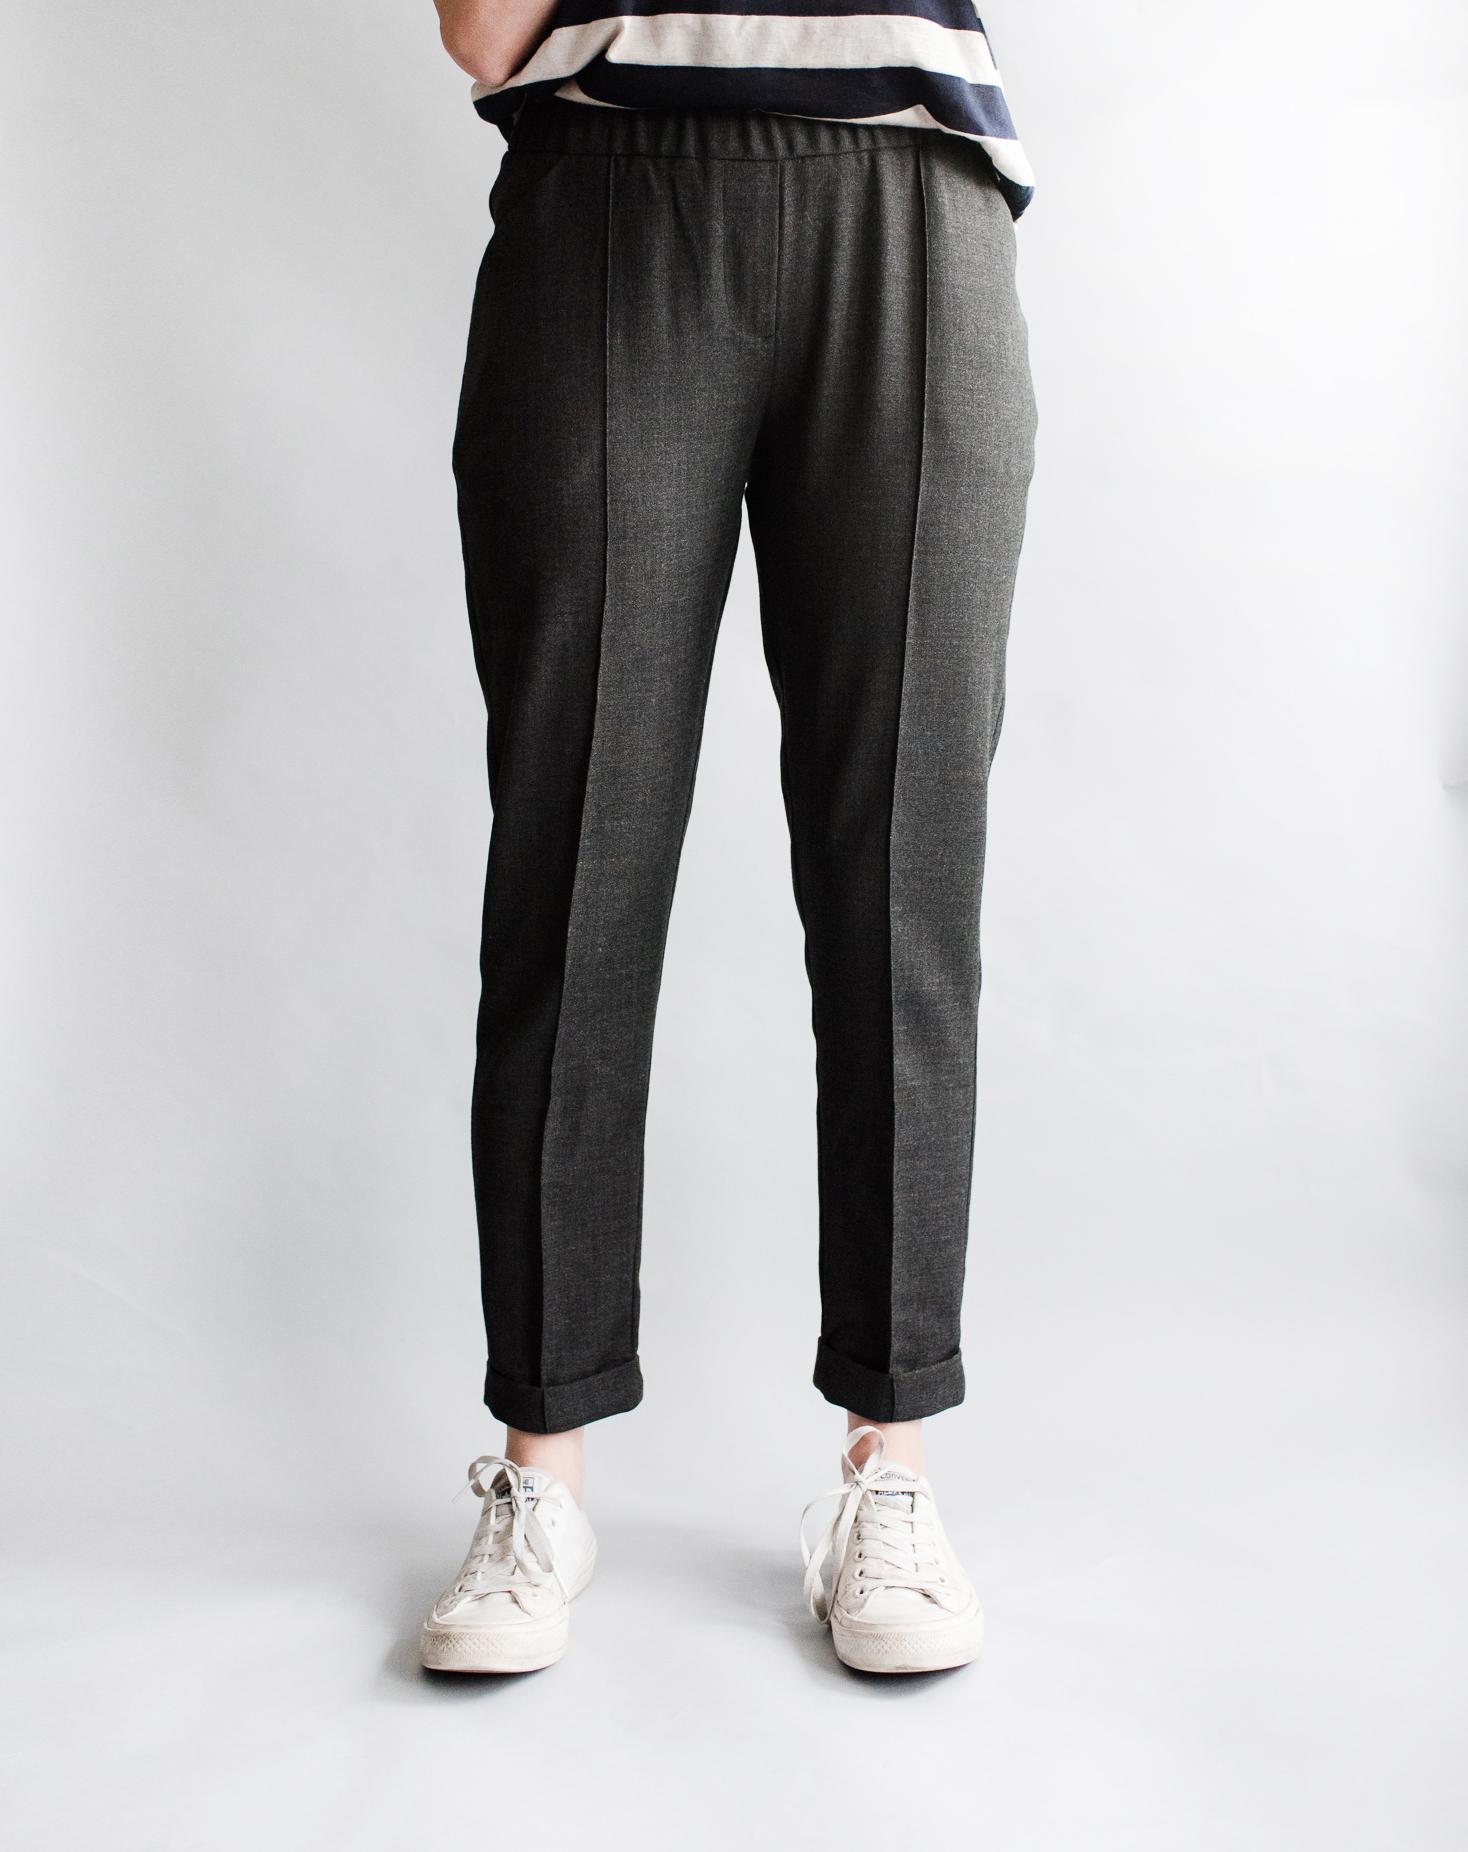 robinson-pdf-sewing-trouser03.jpg